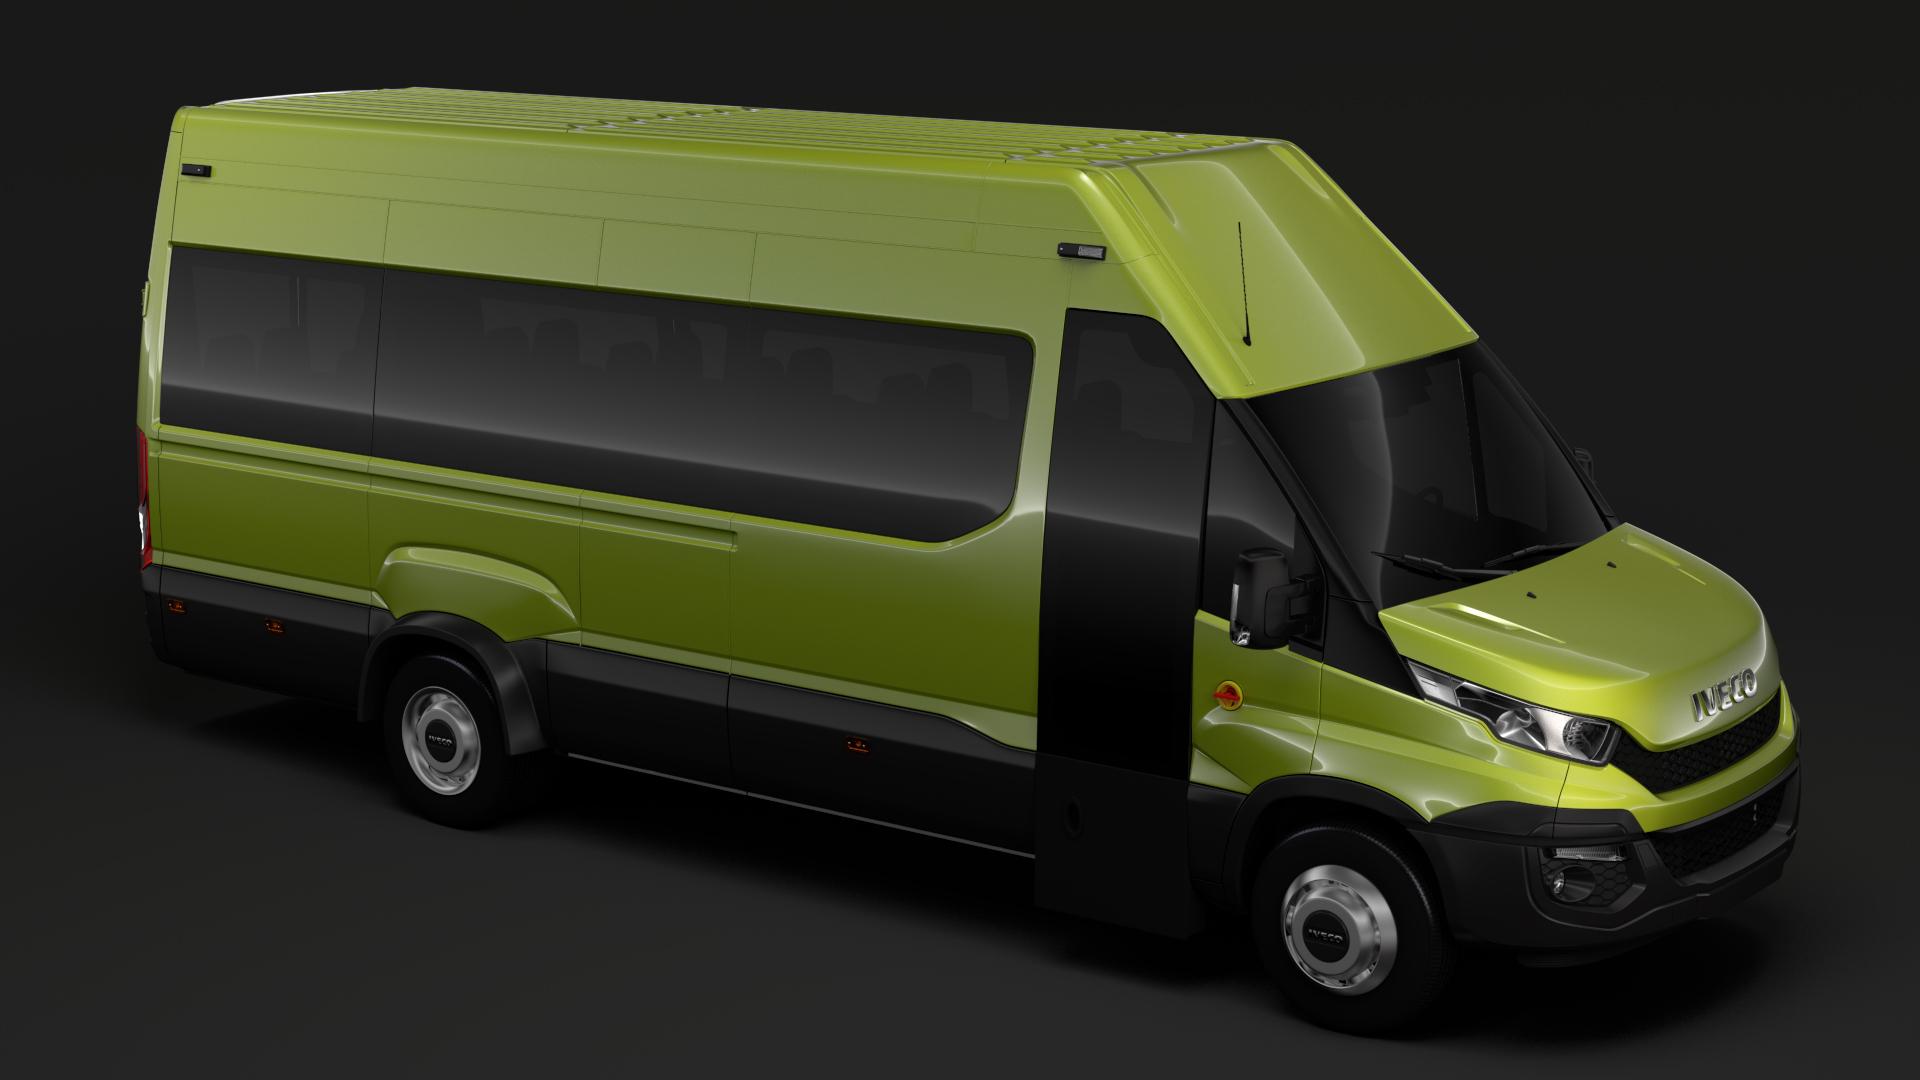 iveco daily tourus l4h3 2014-2016 3d model max fbx c4d lwo ma mb hrc xsi obj 276241